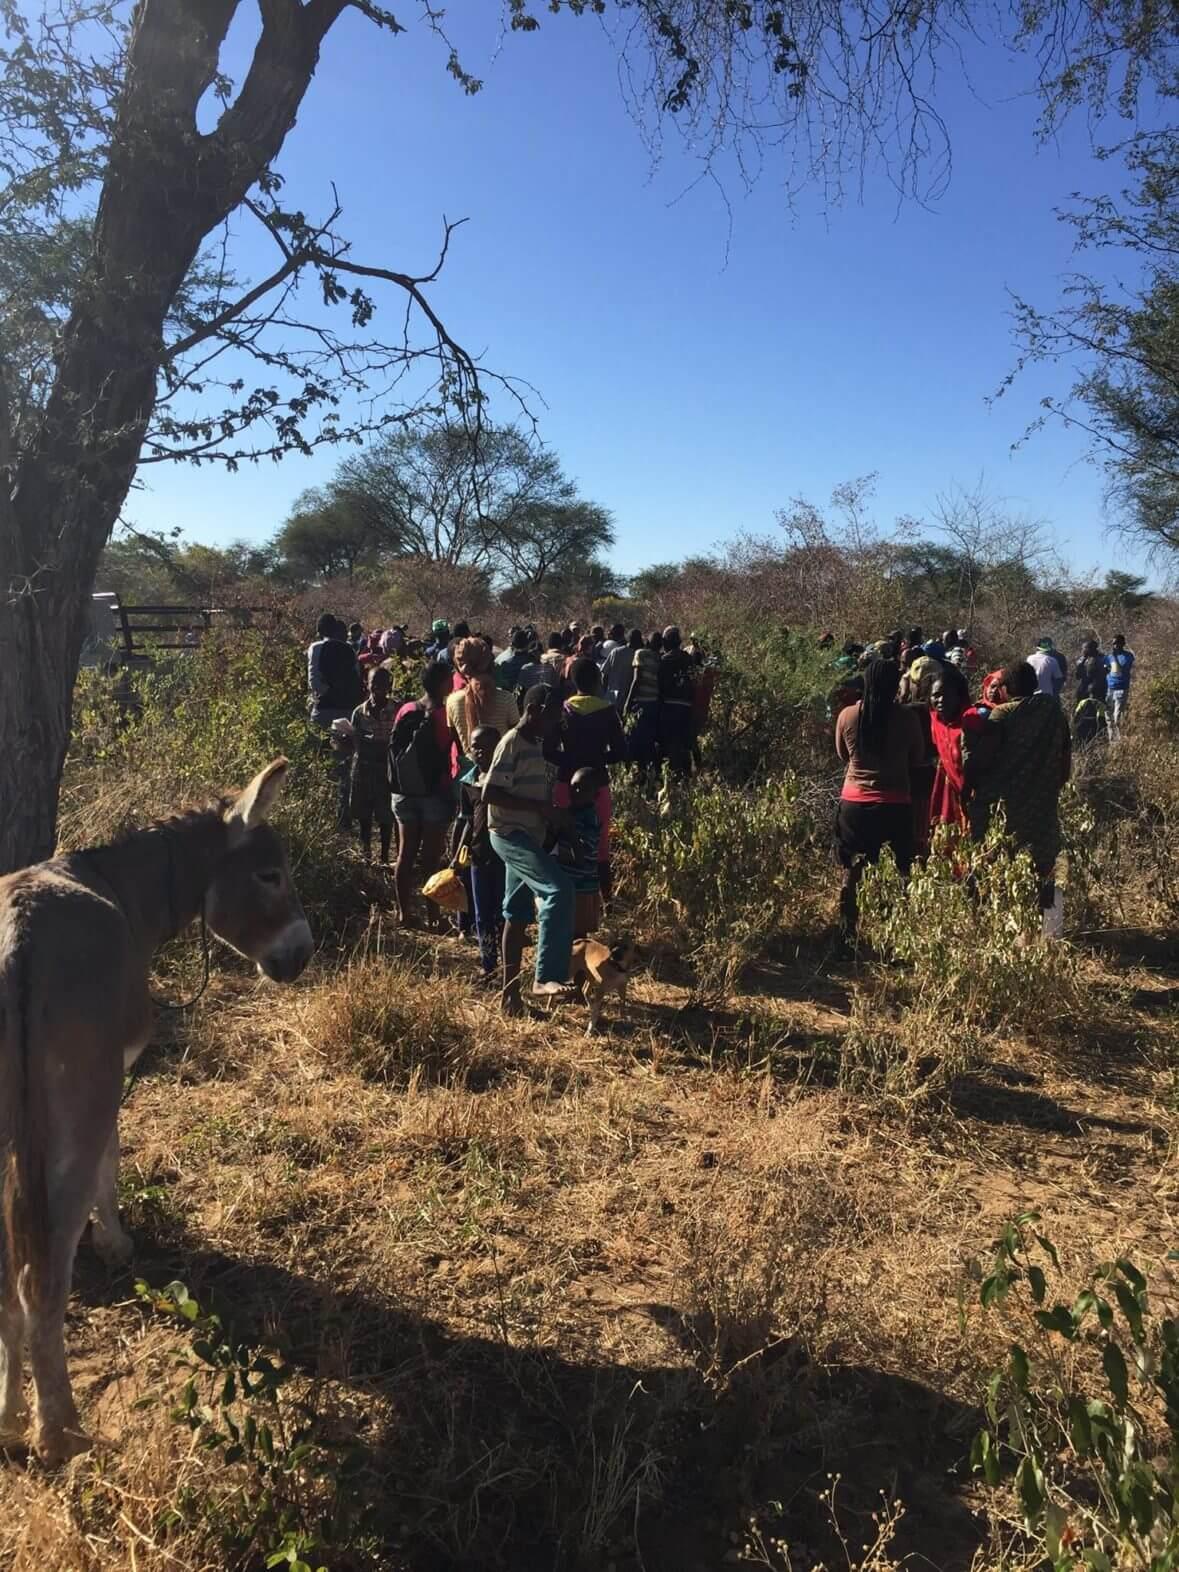 Trophy hunt elephant feeds a hungry village